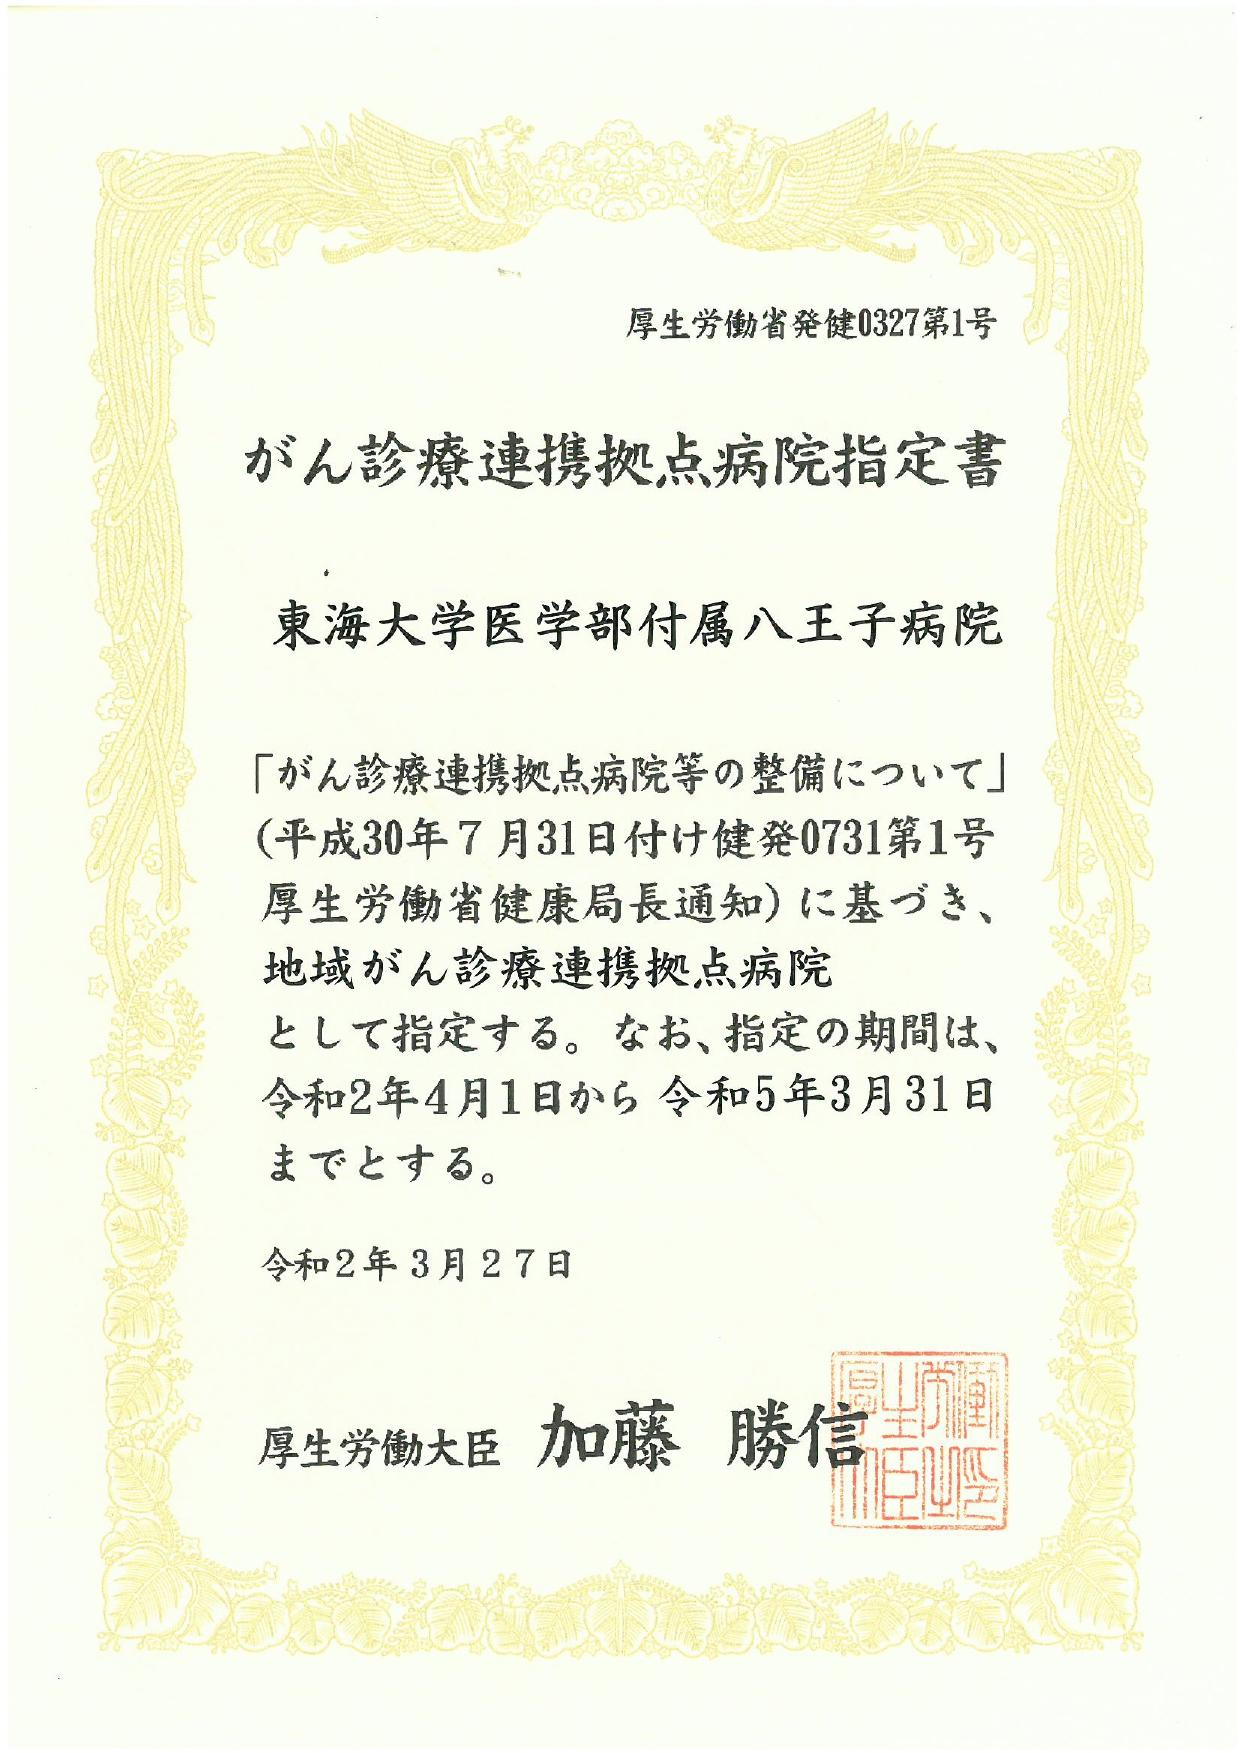 東京都がんす診療連携拠点病院通知書